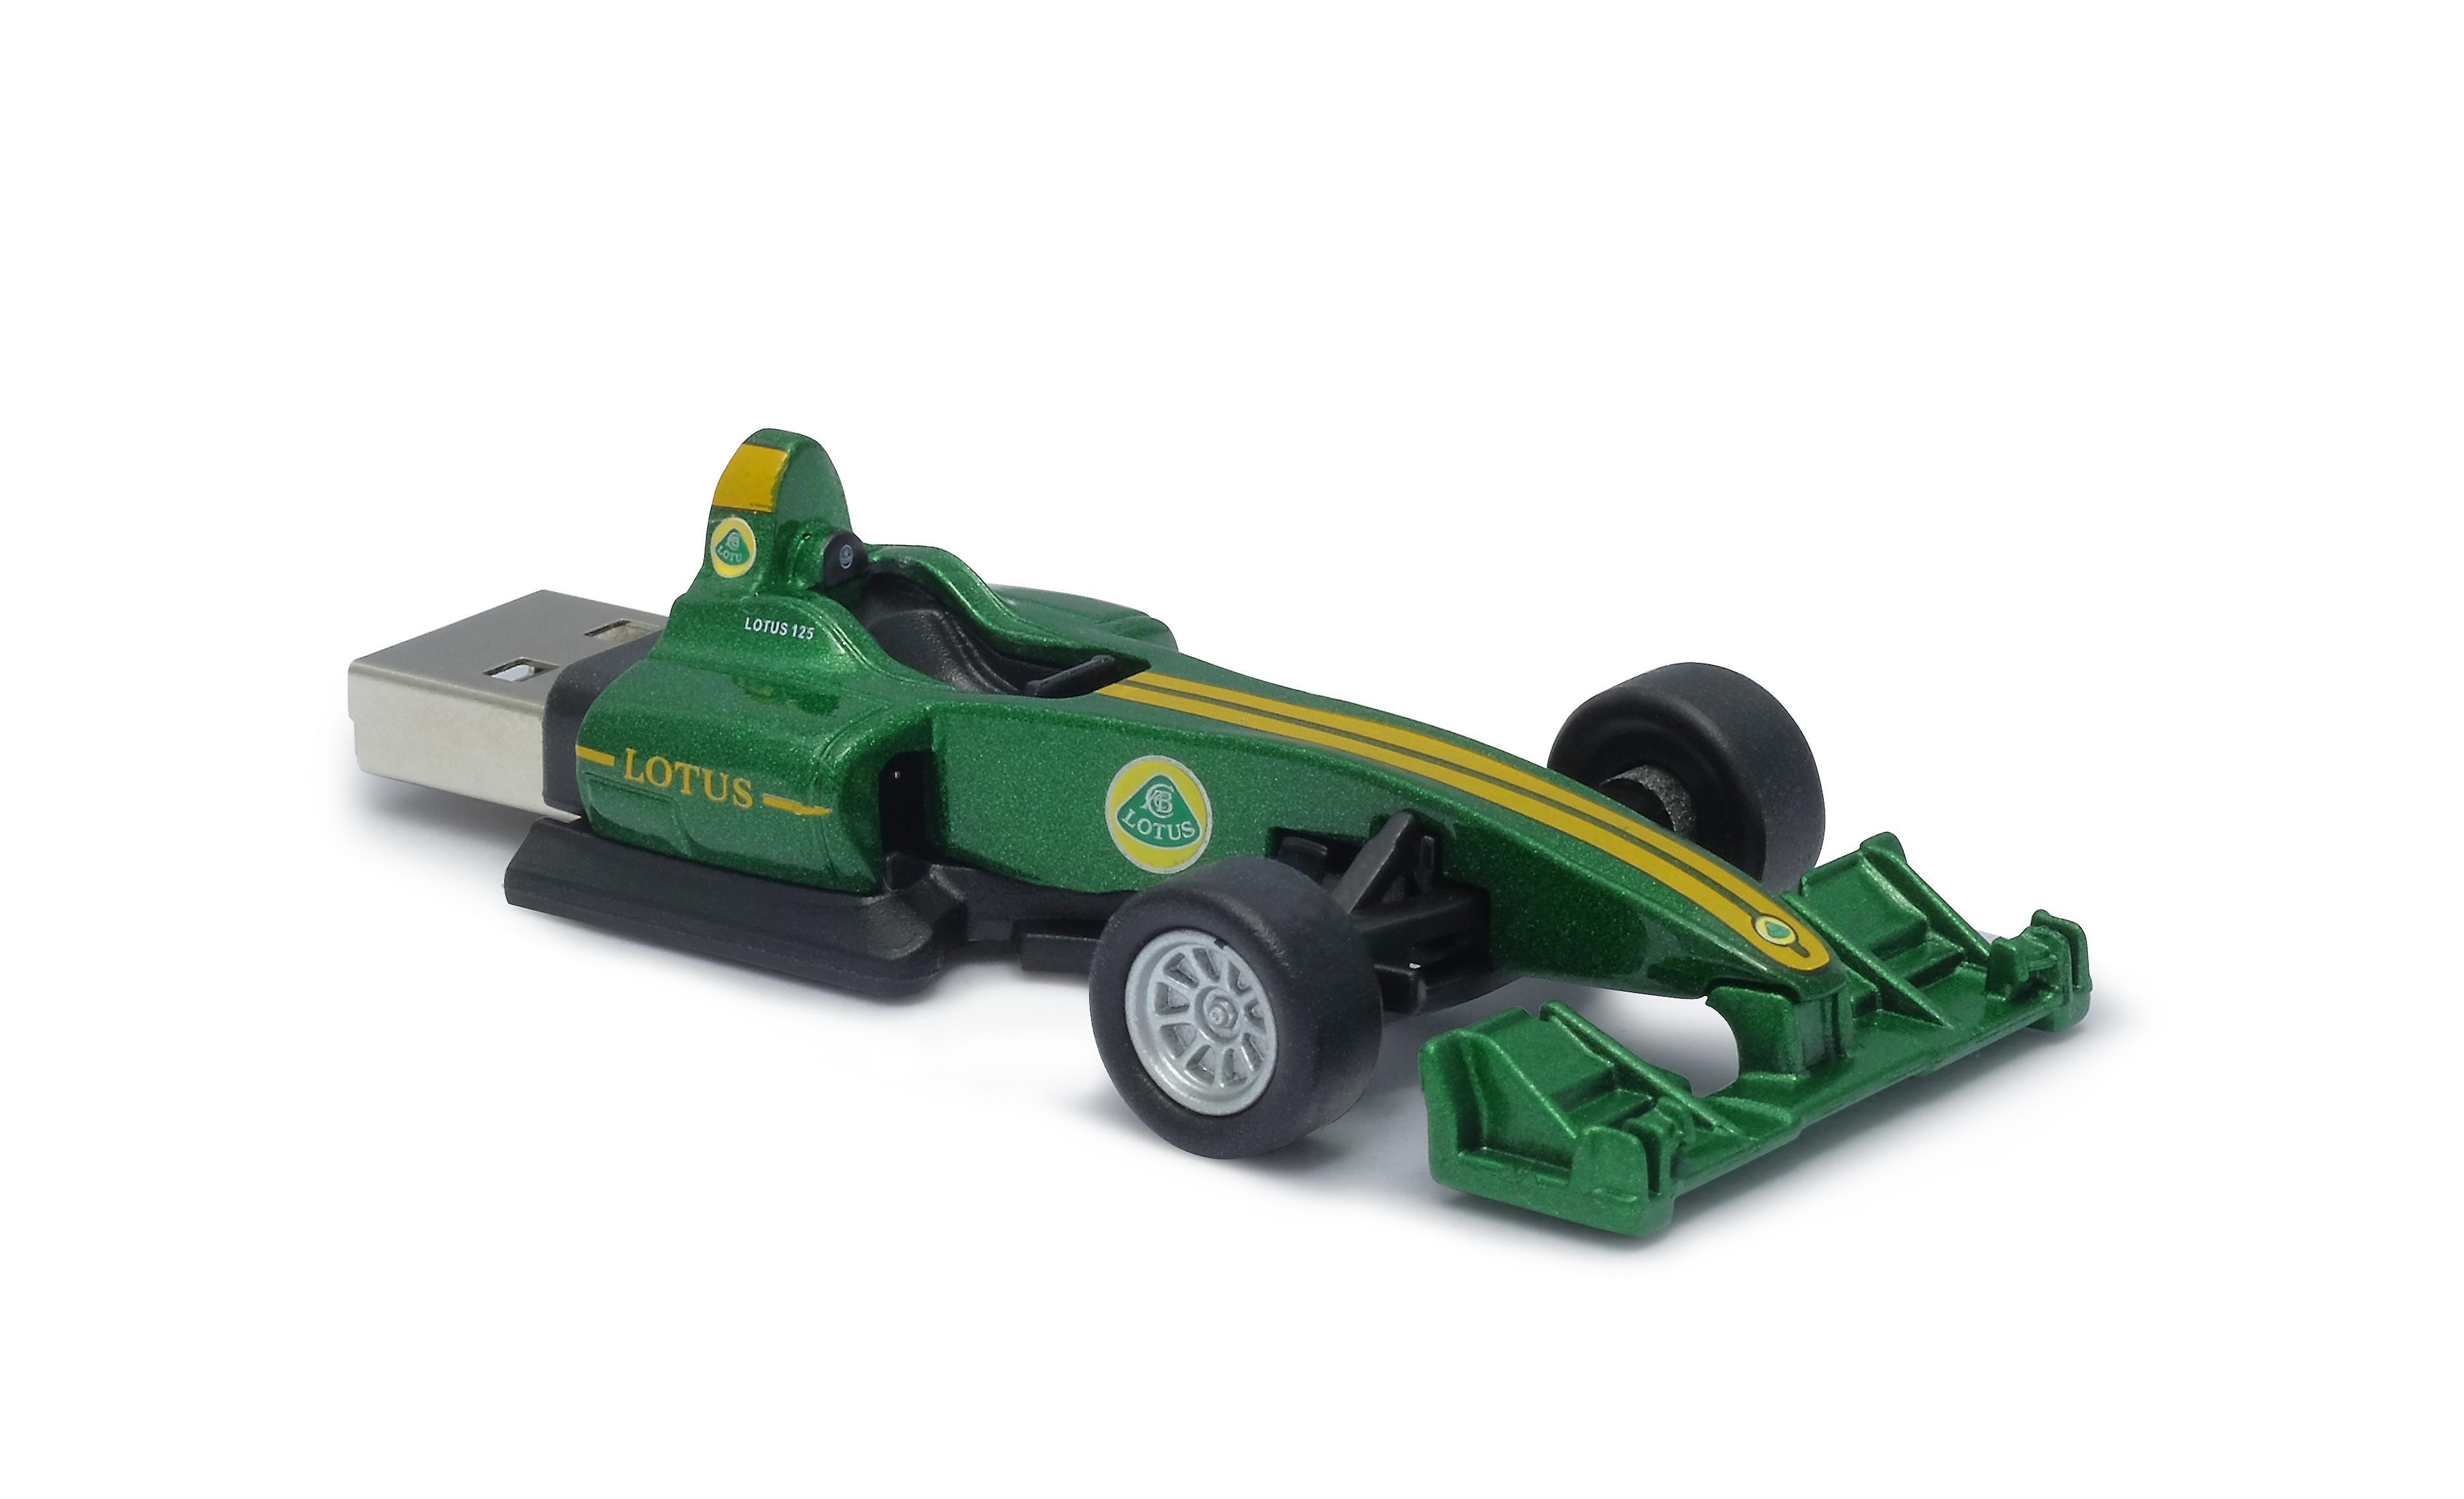 Official Lotus T125 F1 Racing Car USB Memory Stick 16Gb - Green